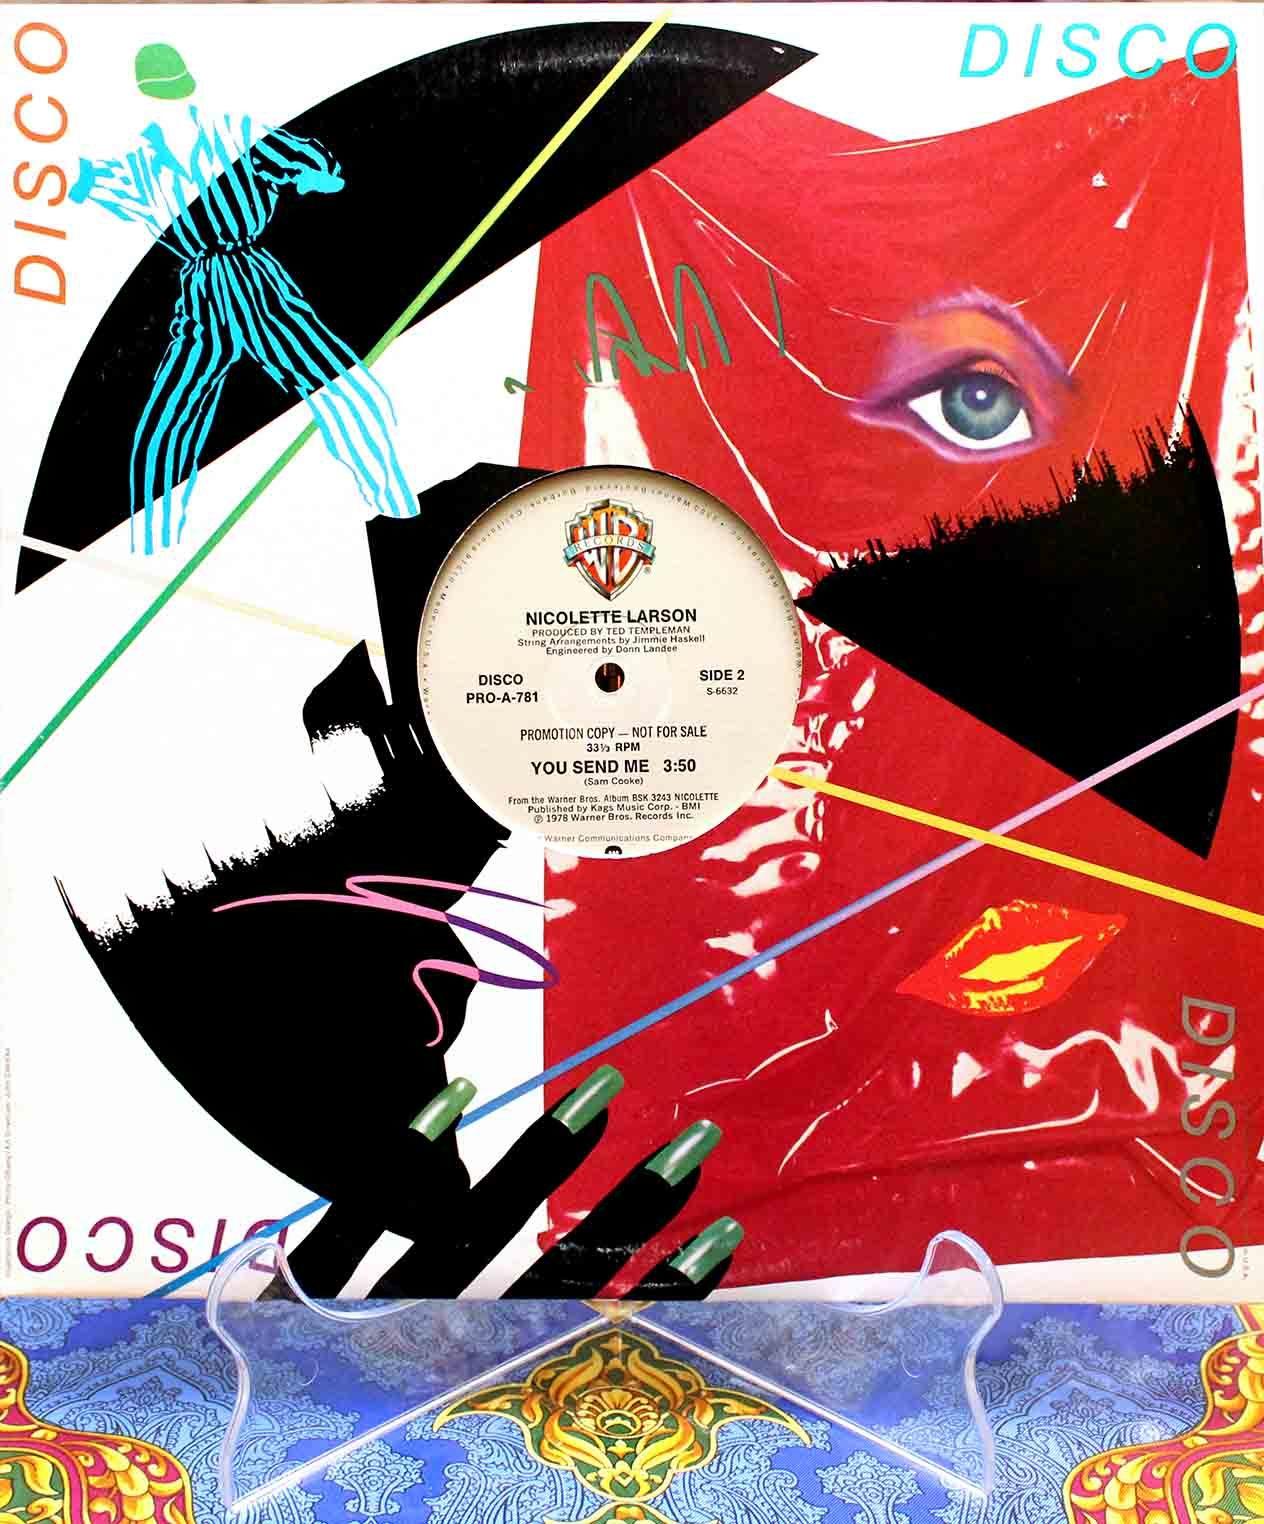 Nicolette Larson – Lotta Love (disco) 02